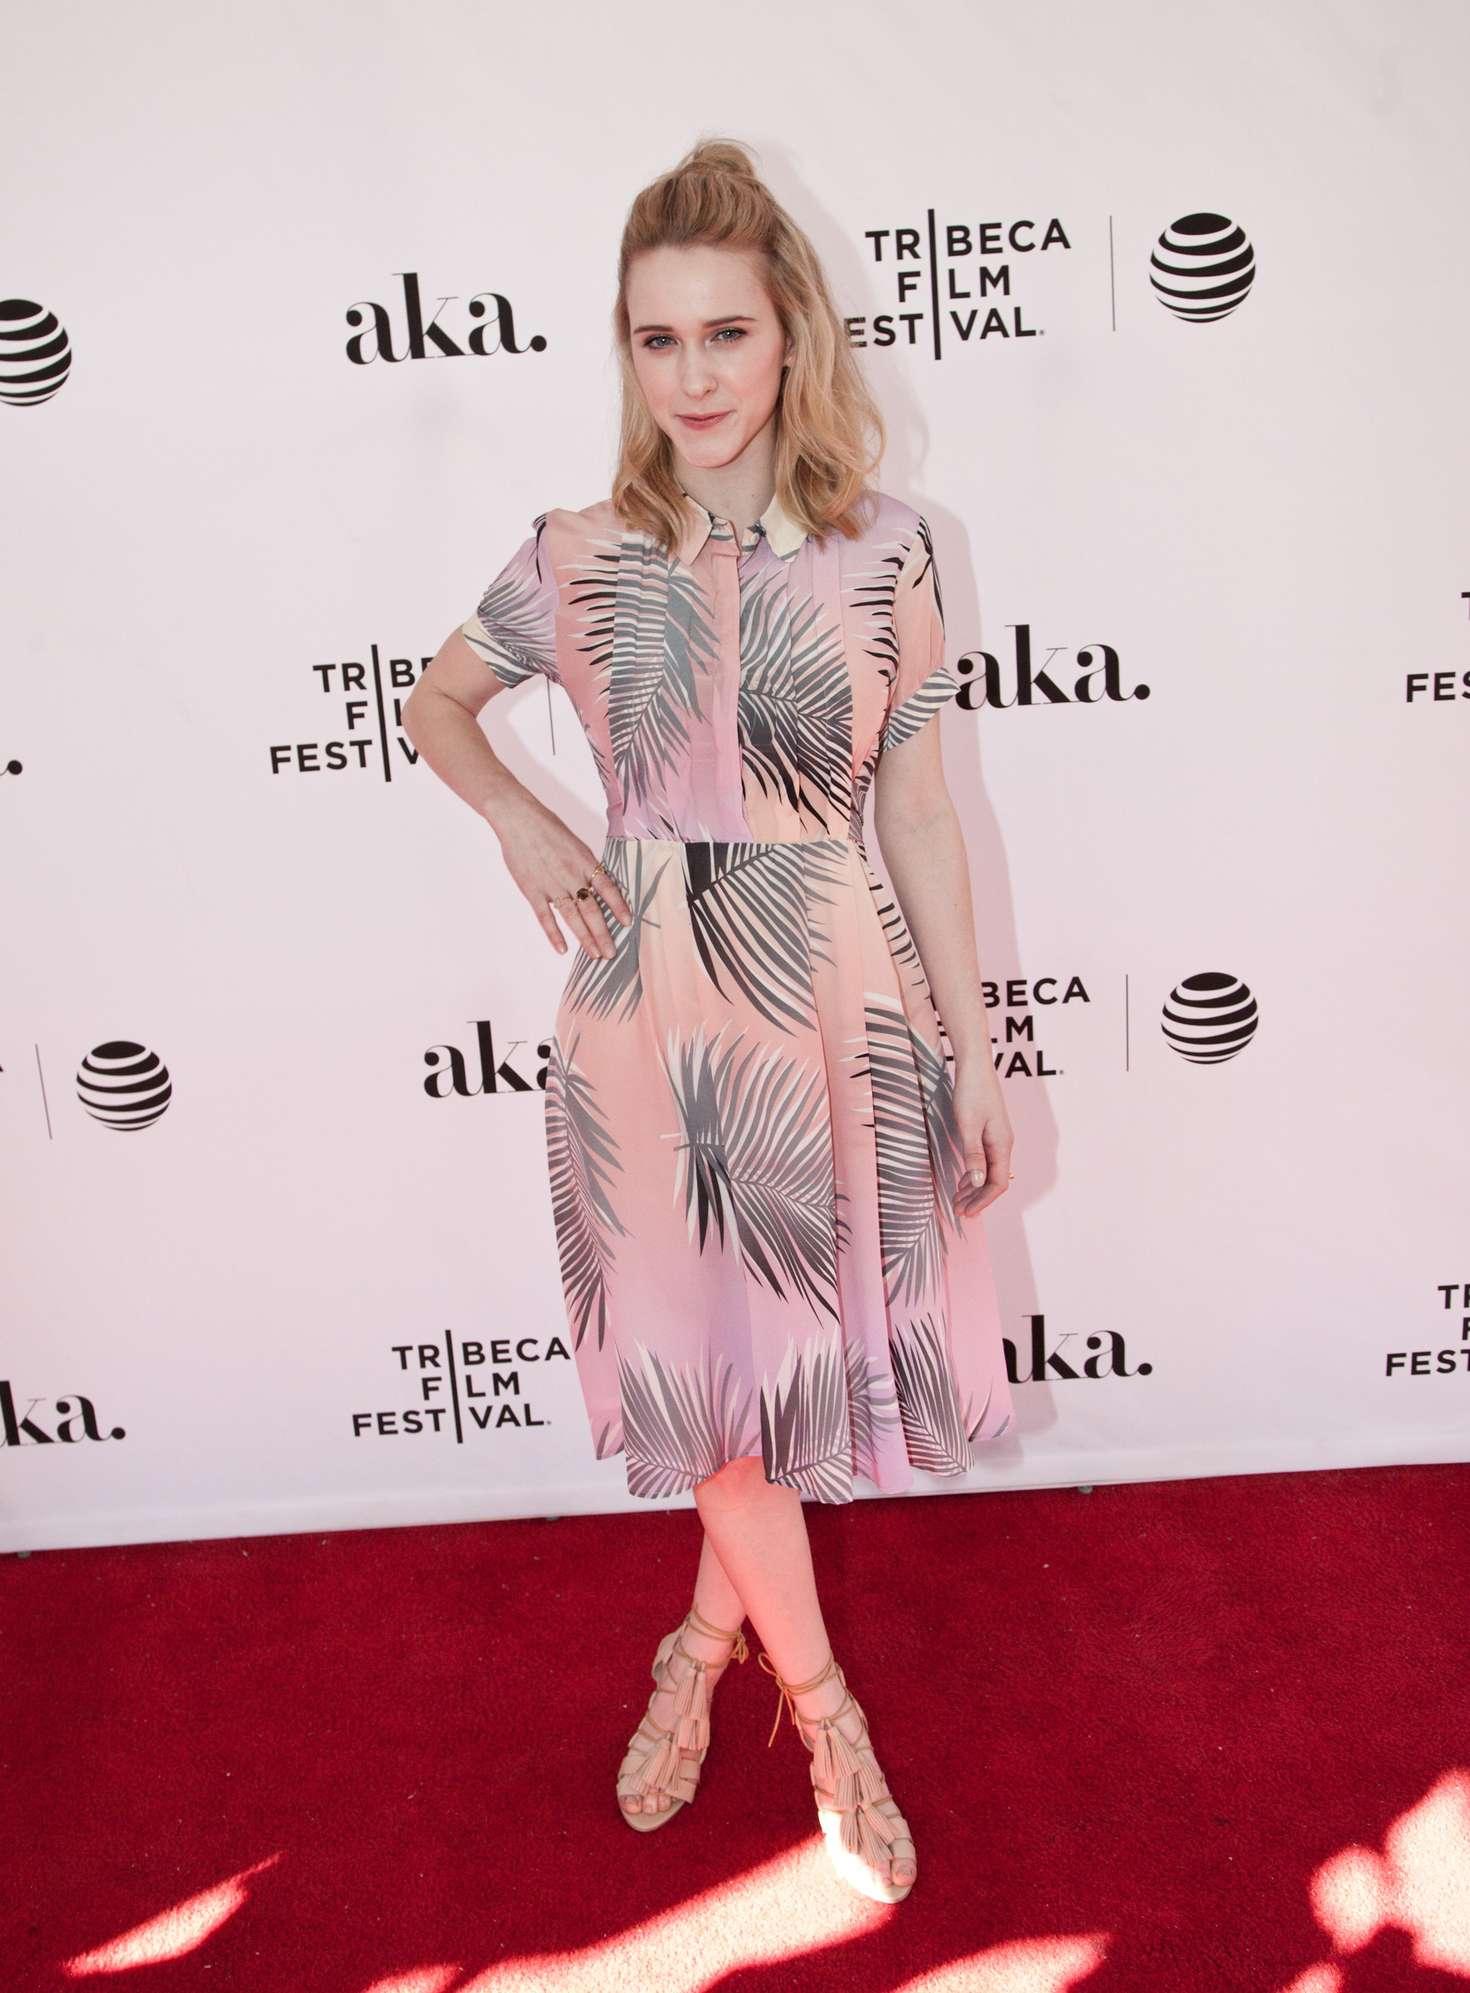 Rachel Brosnahan The Fixer Premiere at Tribeca Film Festival in New York